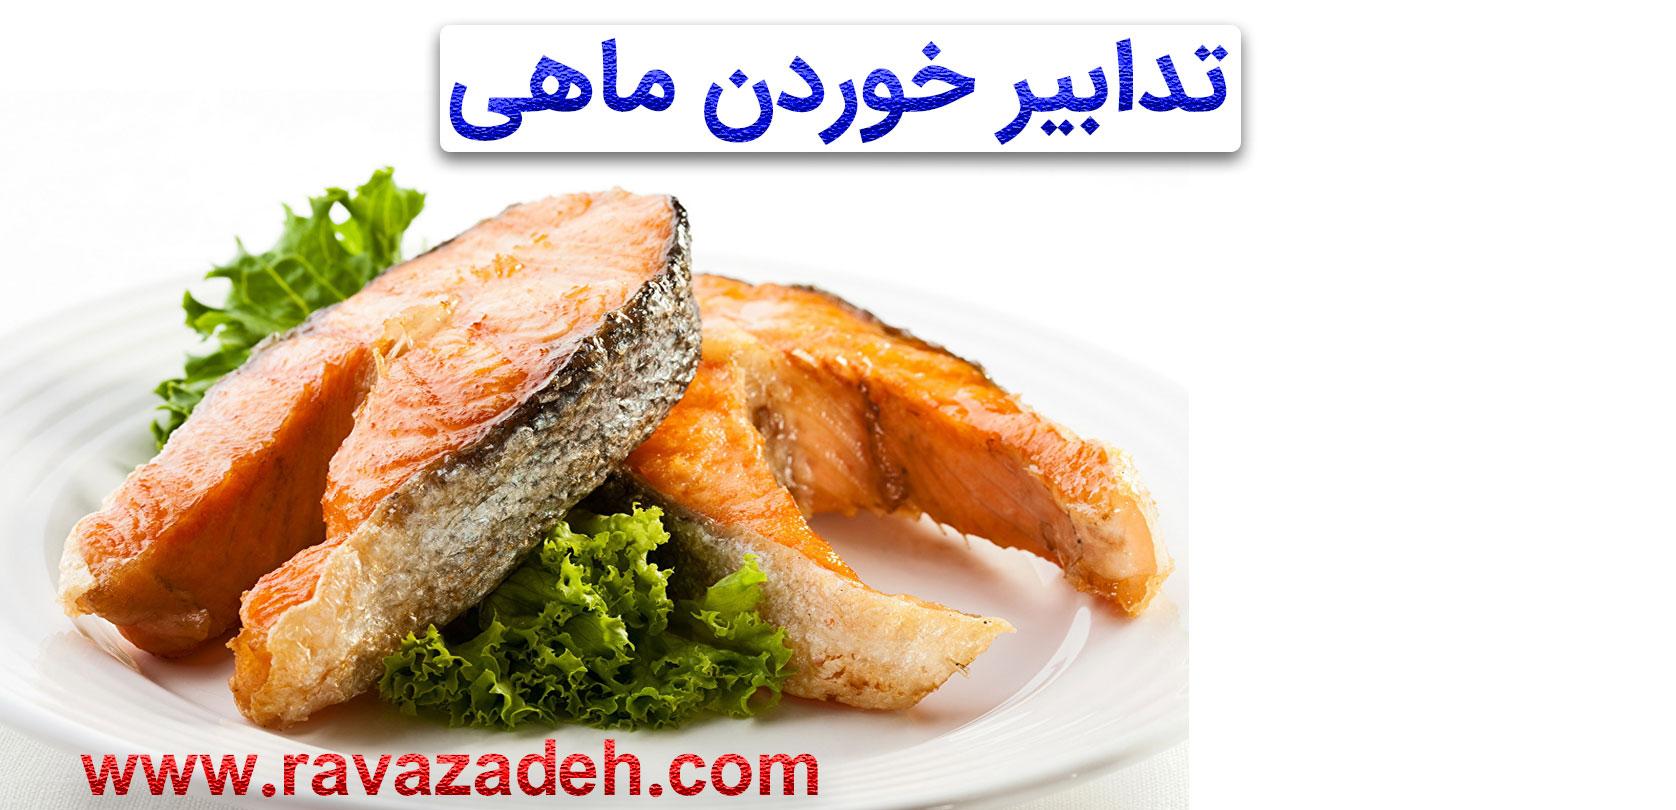 Photo of تدابیر خوردن ماهی